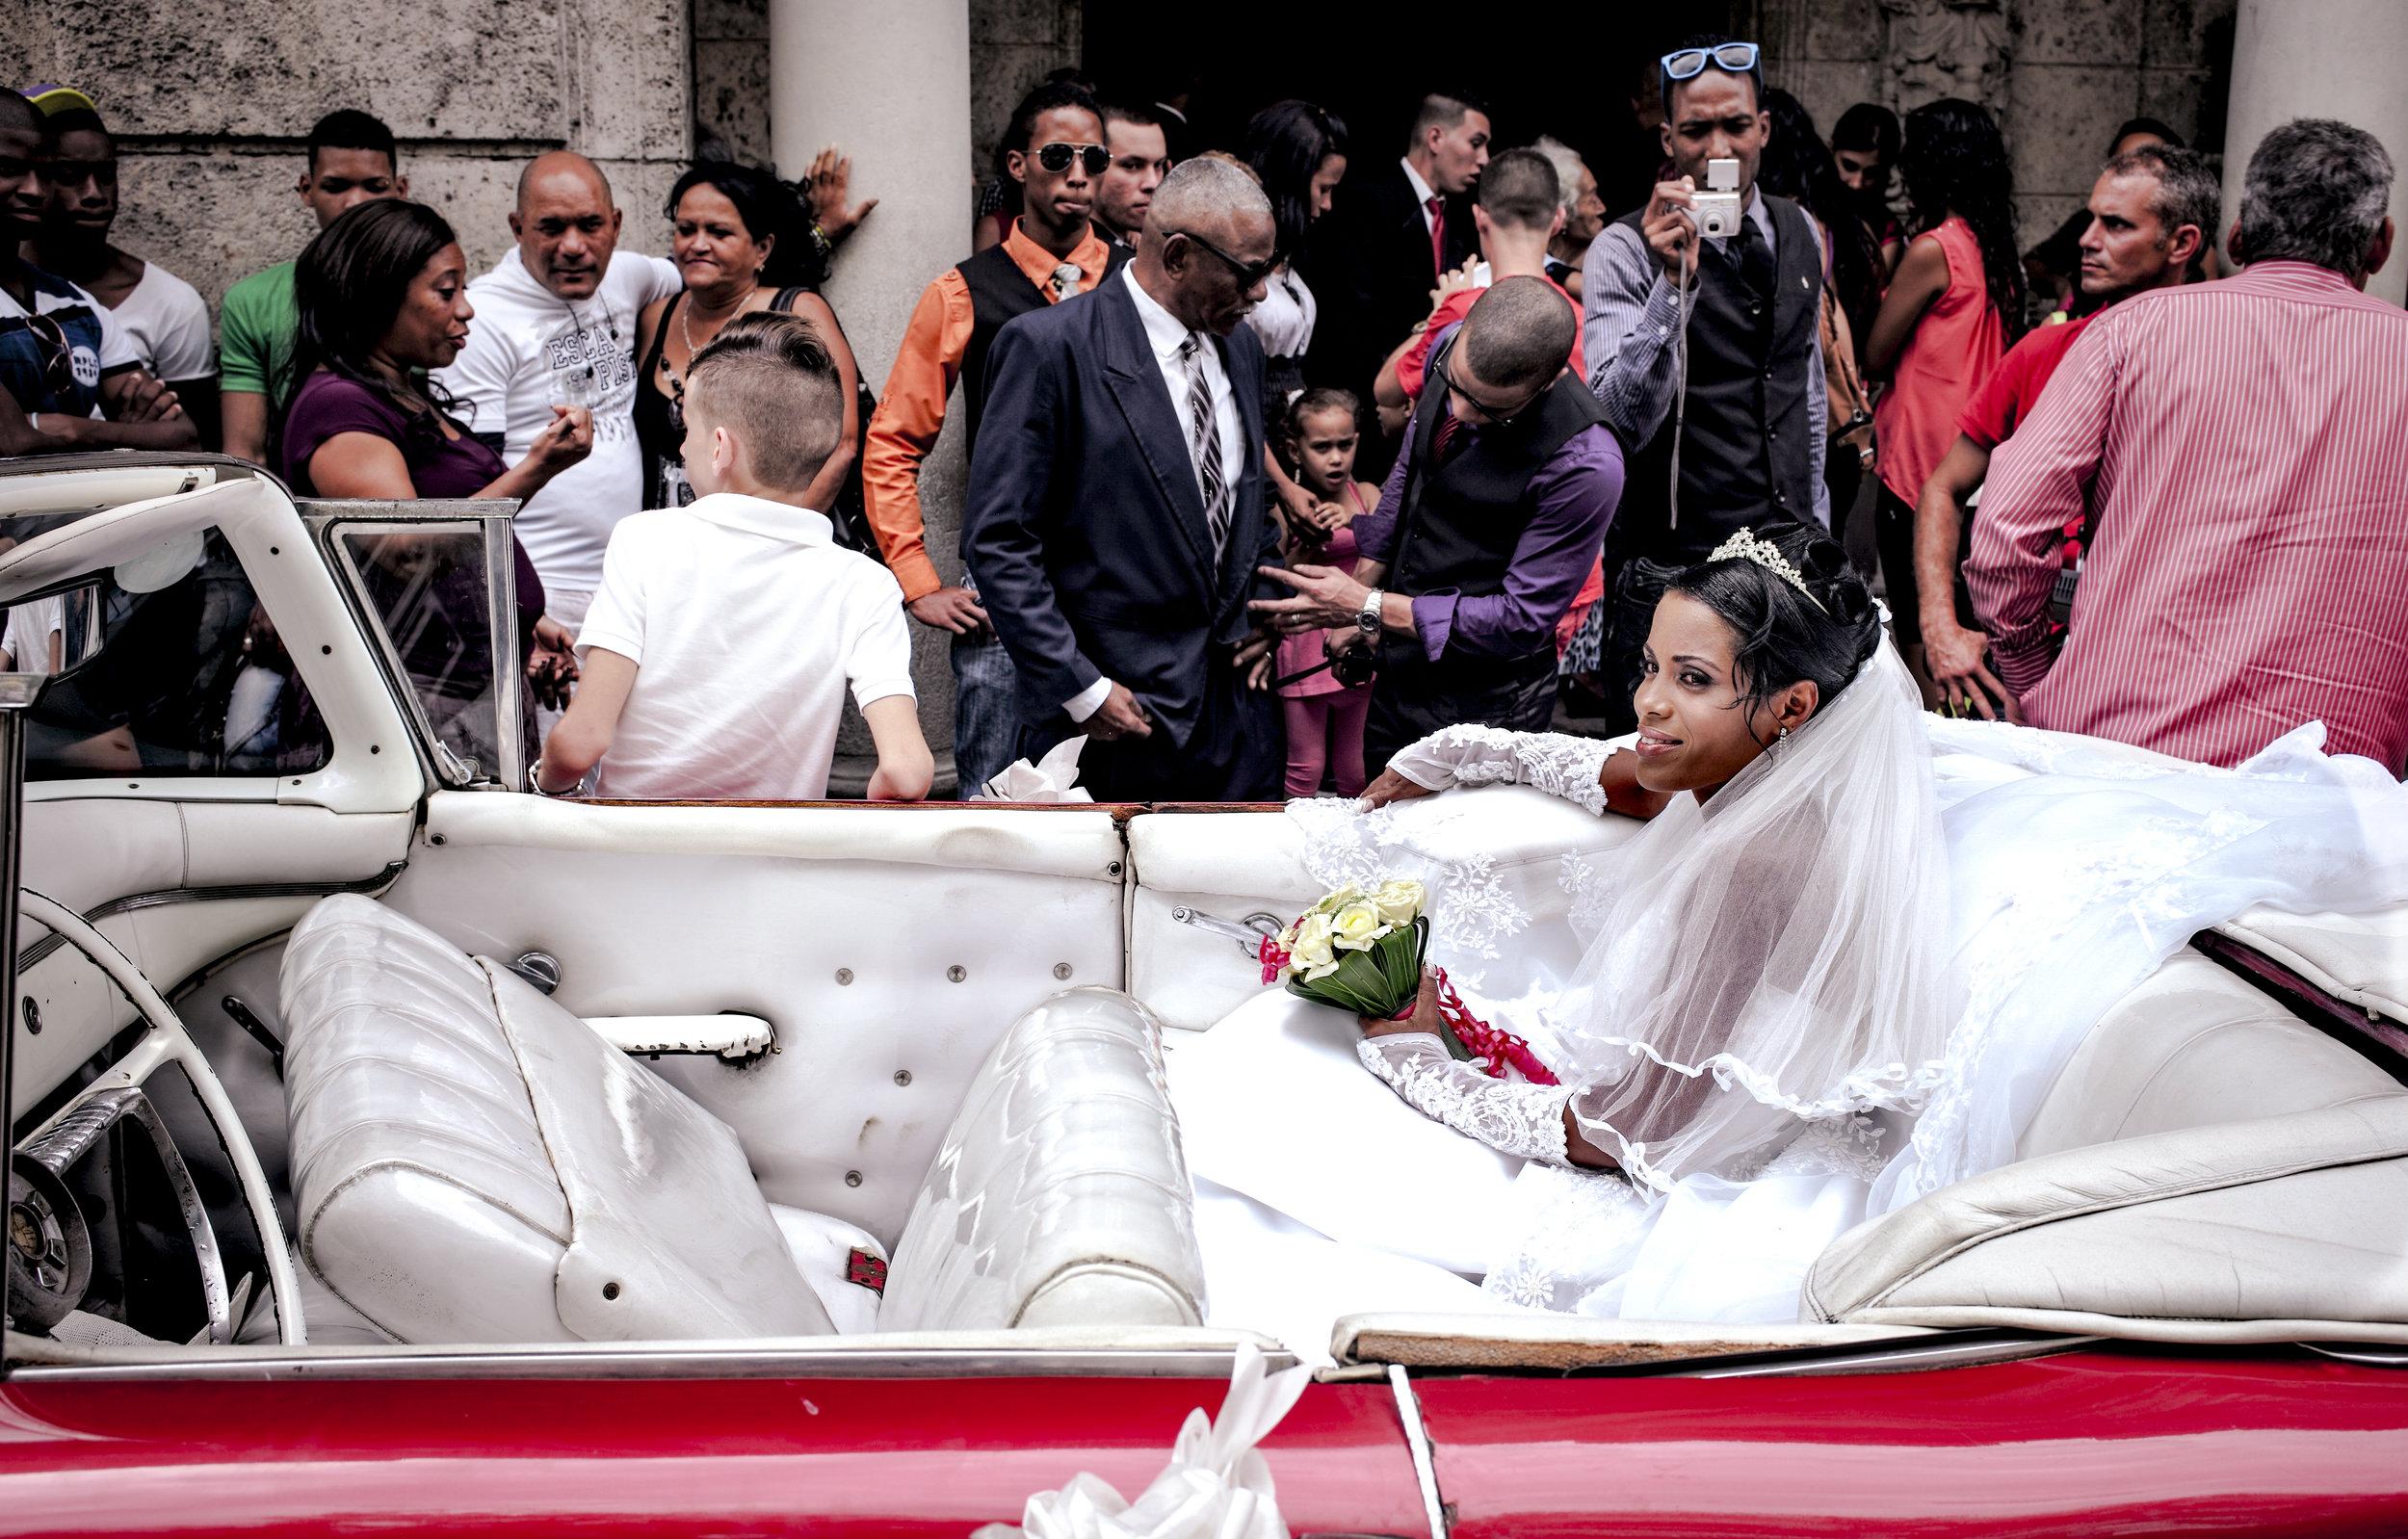 Cuba bride revised.jpg